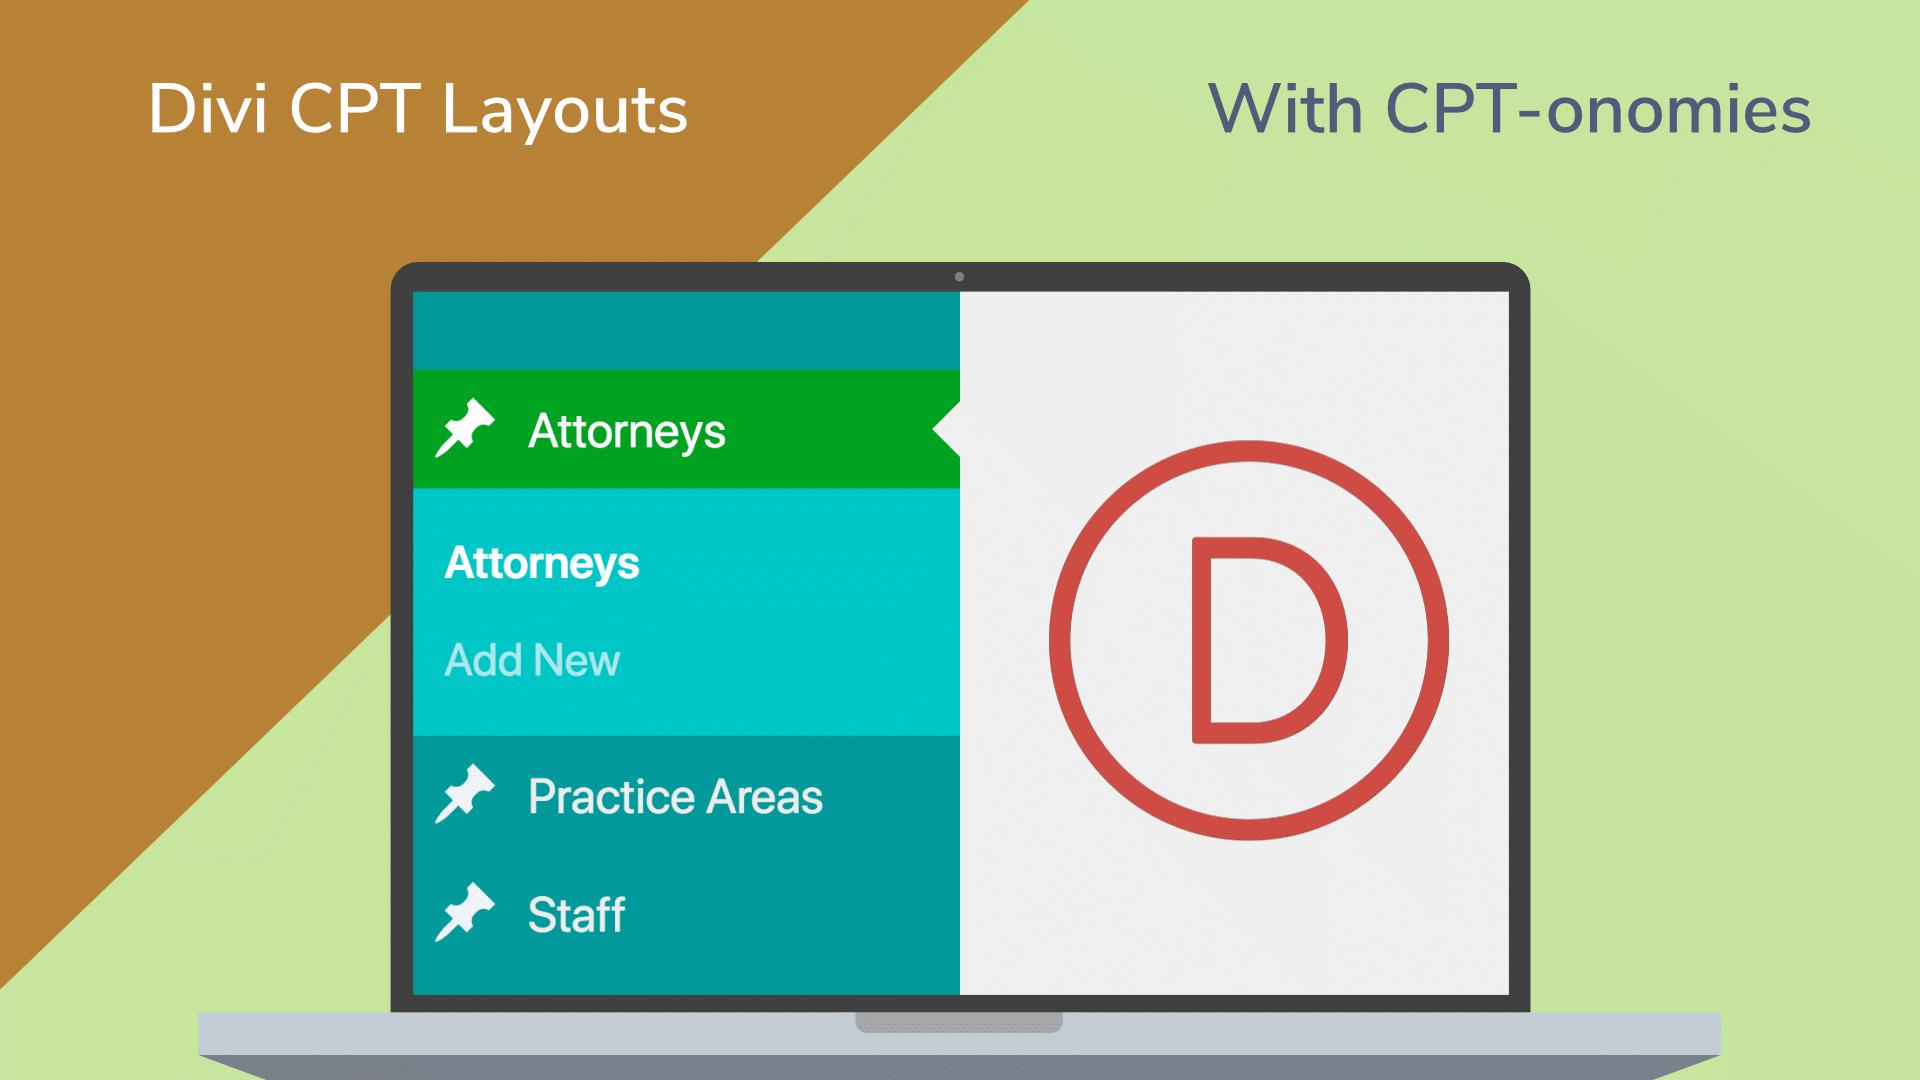 Divi custom post types layouts cpt onomies custom fields